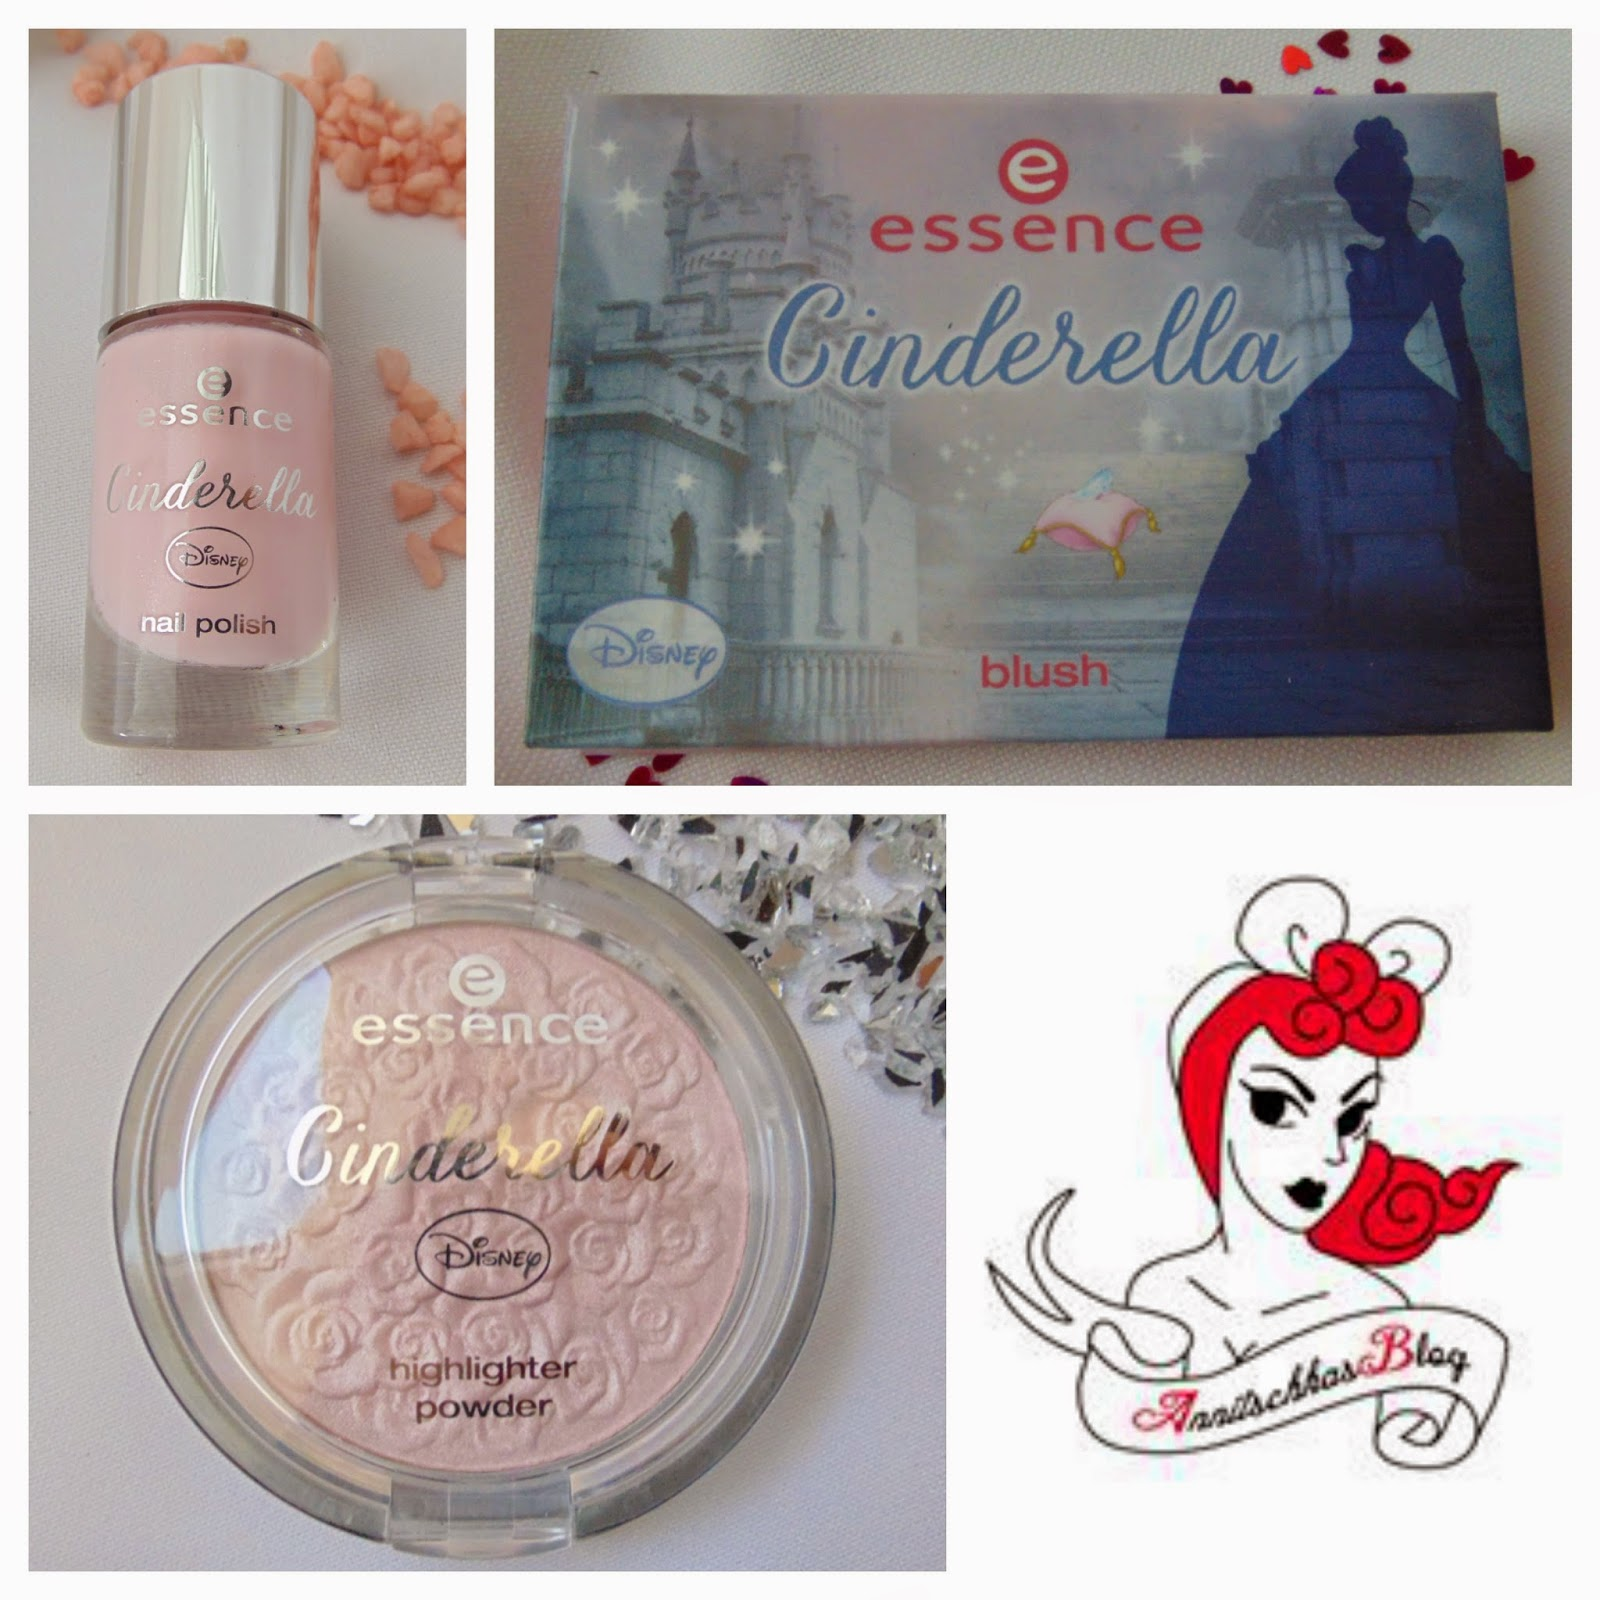 Essence: Cinderella Limited Edtion - www.annitschkasblog.de